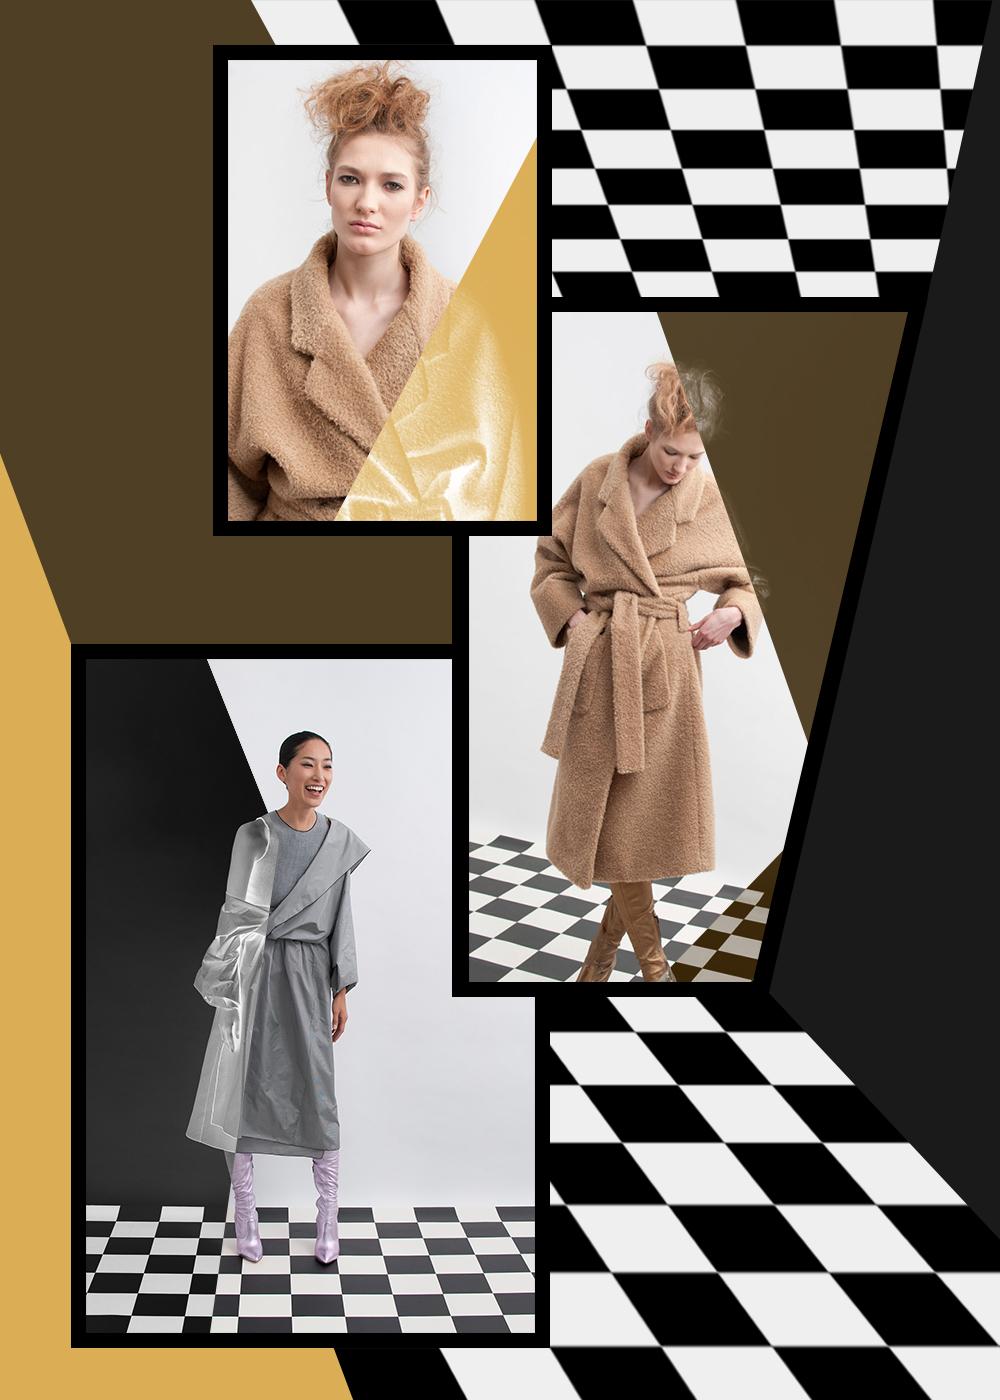 Maison-Mittweg-Designers-Fashion-Isa-Arfen-Tina-Chow-Inspired